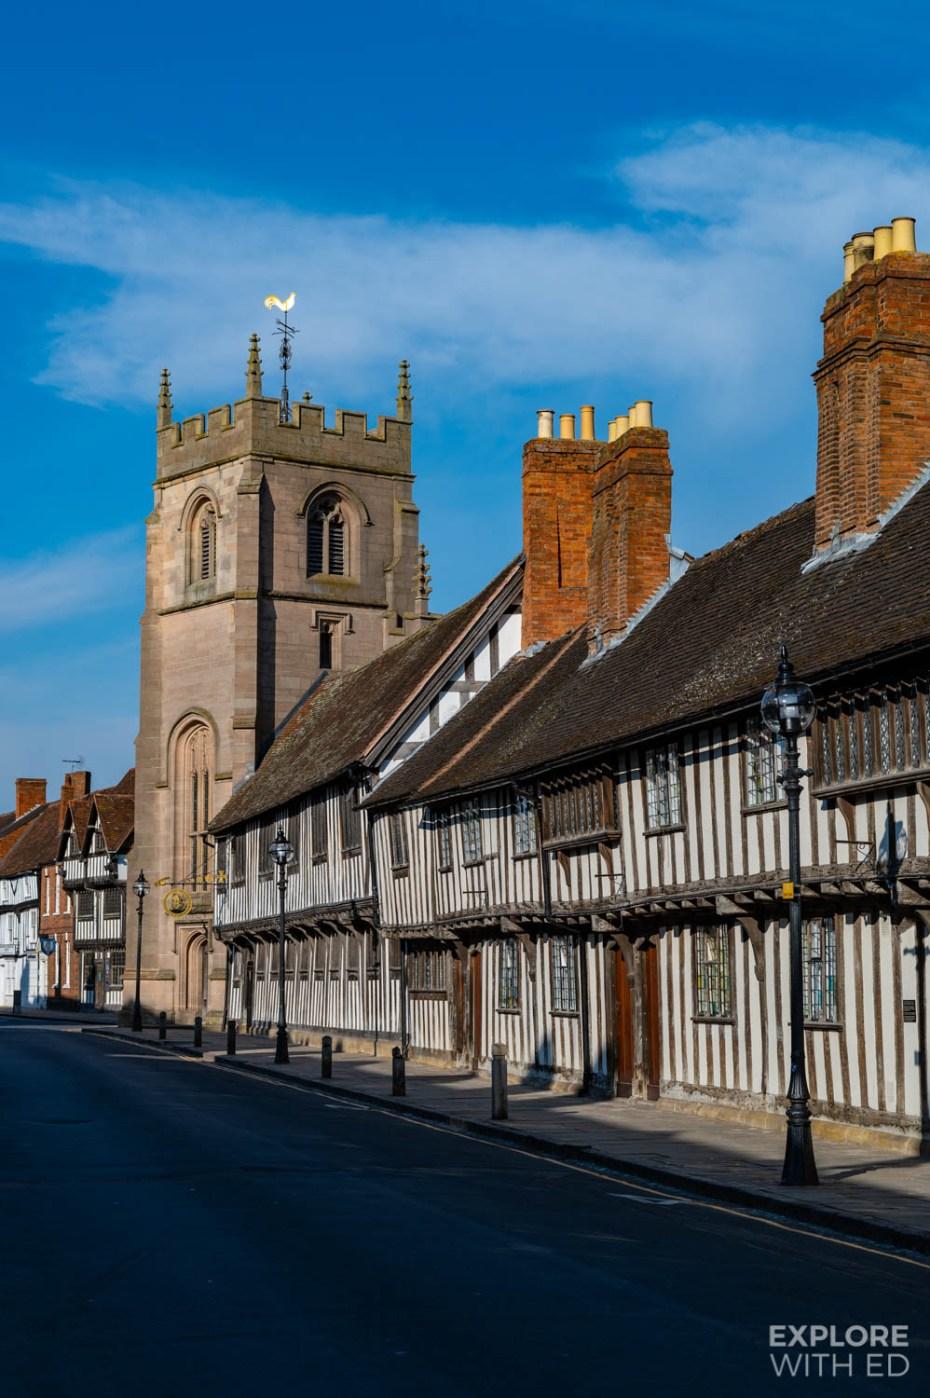 Shakespeare's Stratford-upon-Avon